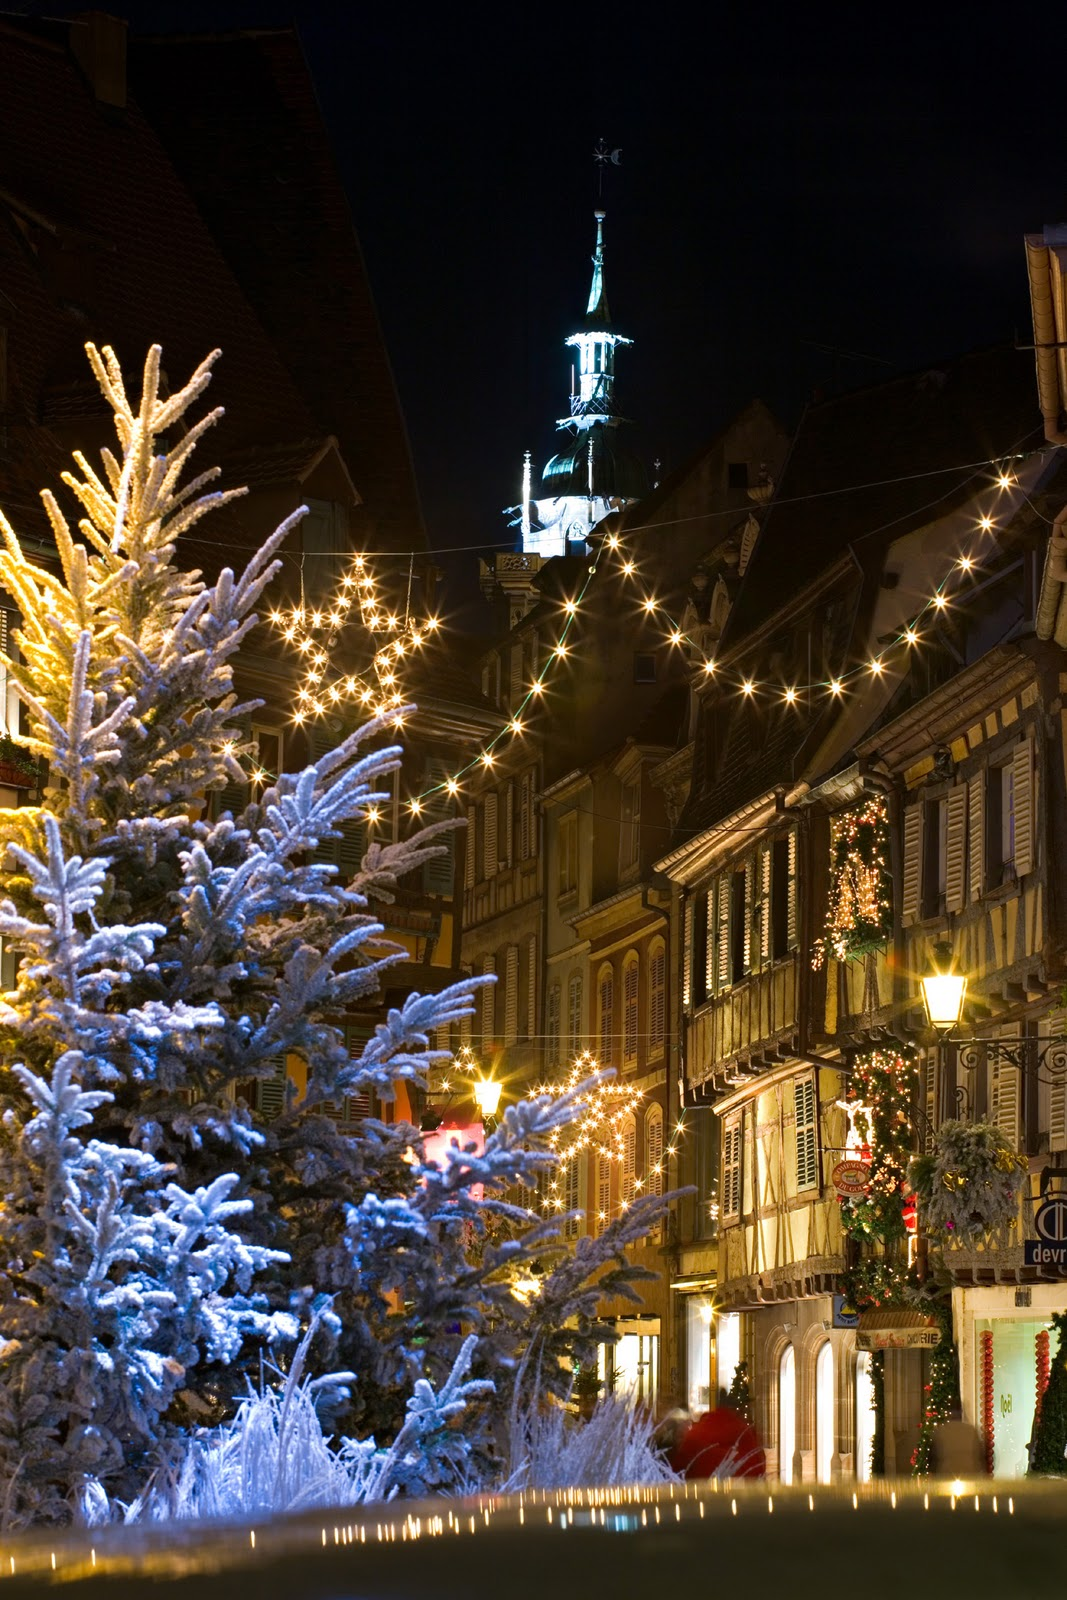 http://4.bp.blogspot.com/-gIX9KpHrW4s/TuPc6JGqxvI/AAAAAAAAB5g/NOYhiHDILNI/s1600/France+Alsace+Christmas+Colmar+via+copyright+CRTA+-+Meyer.jpg